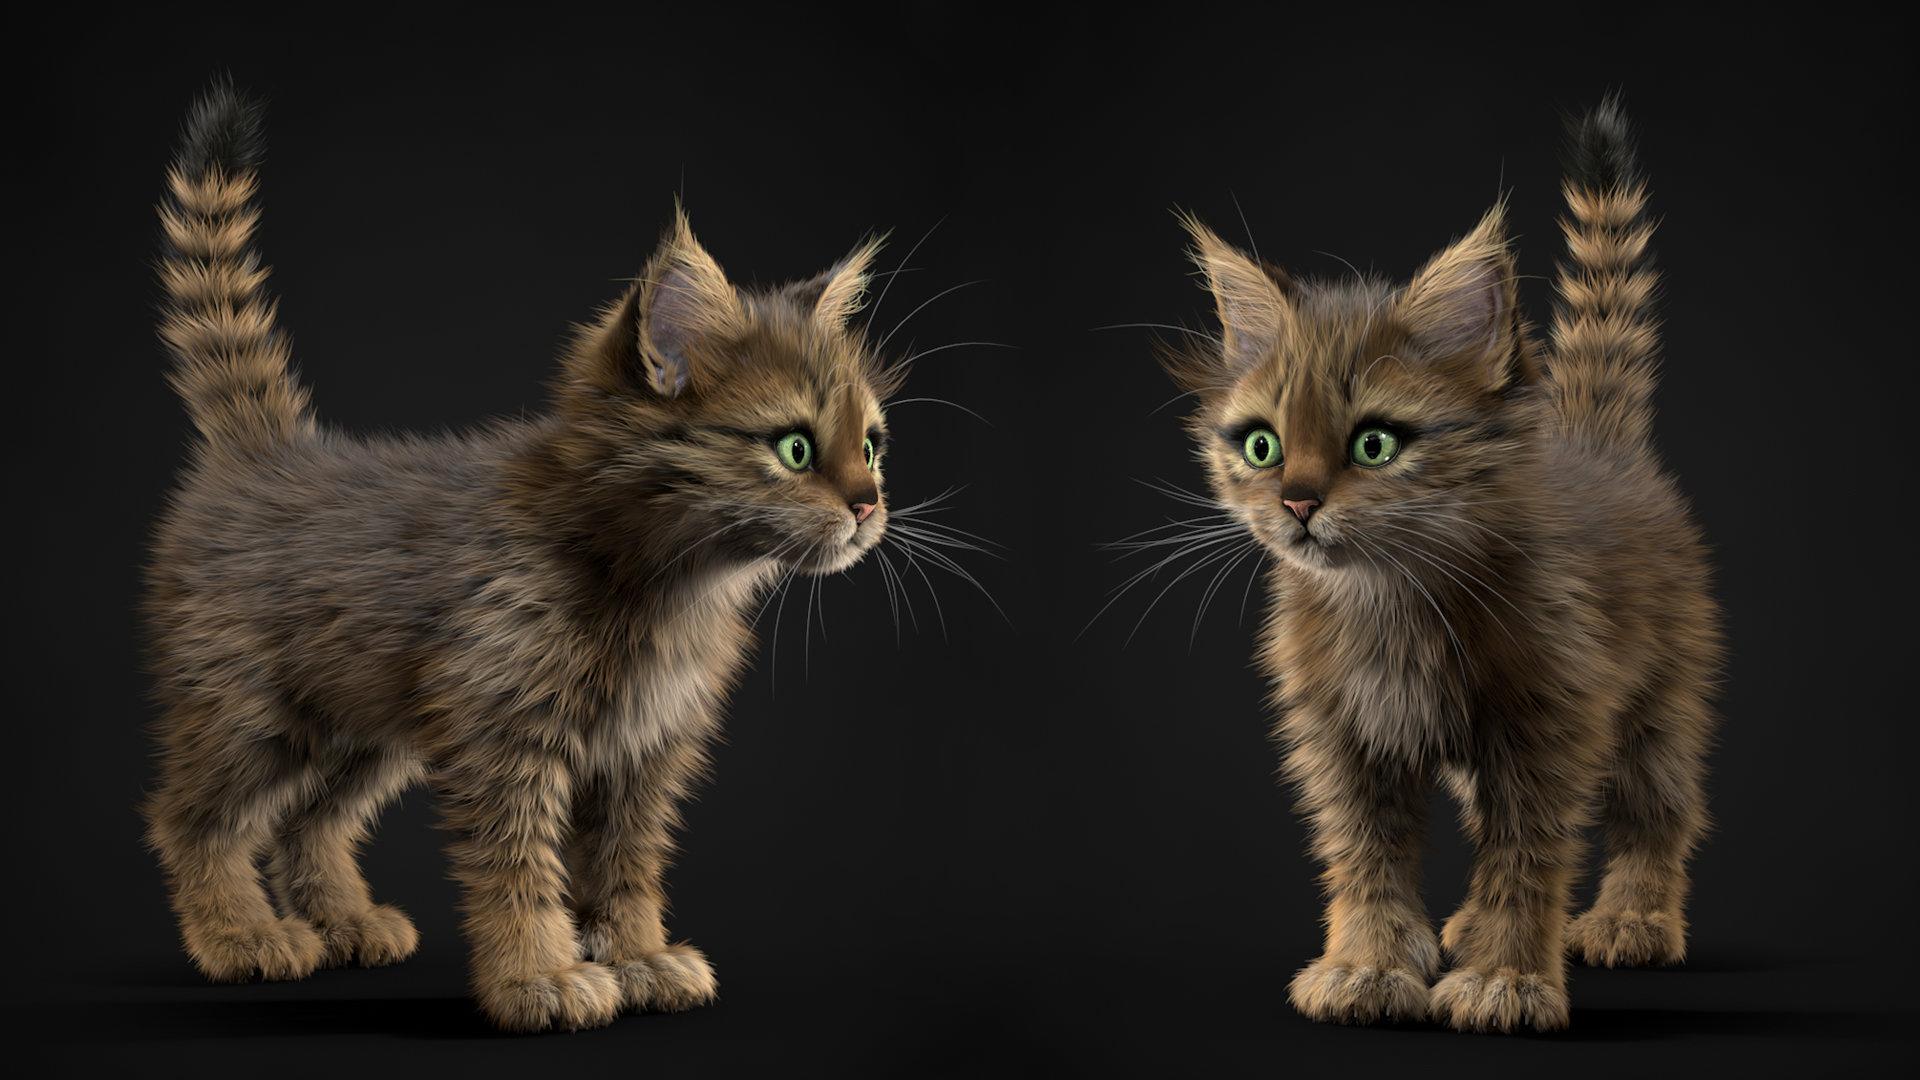 cinema 4d cat model에 대한 이미지 검색결과